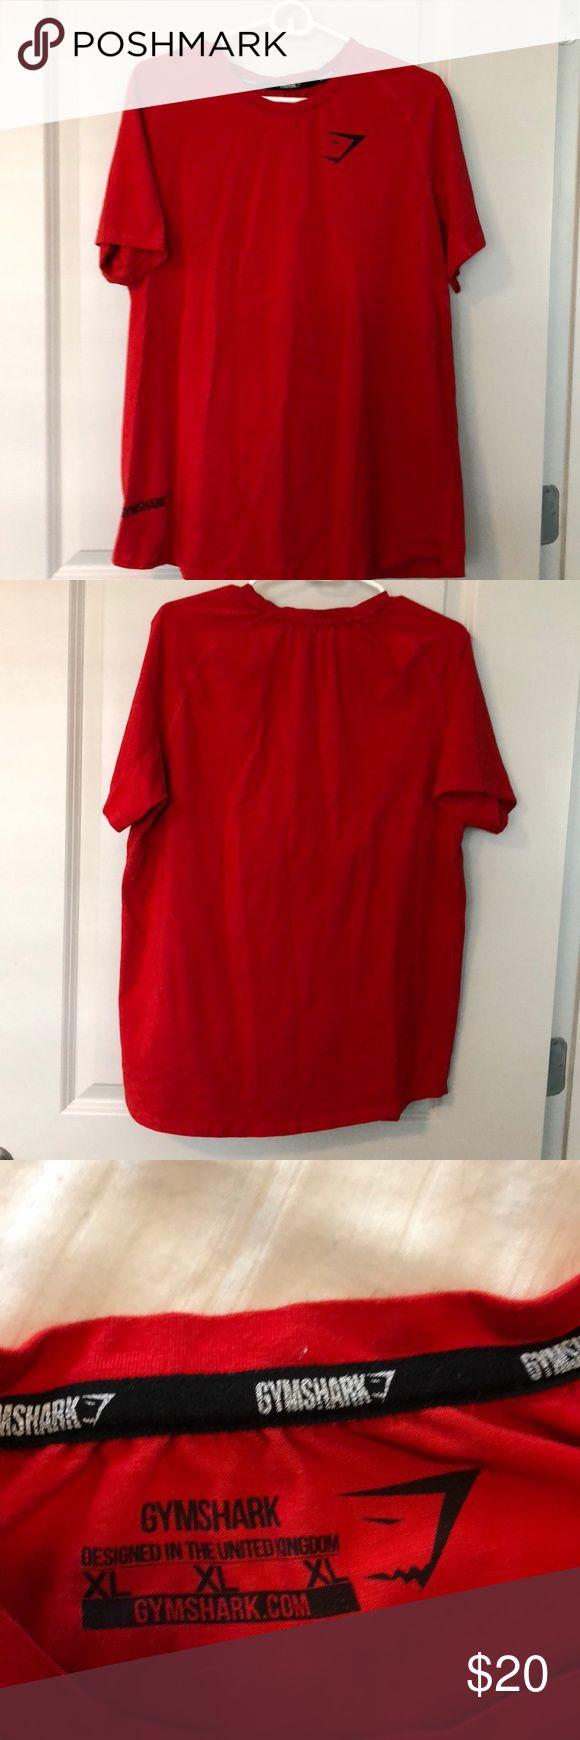 Gymshark red T-shirt Gymshark red T-shirt Gymshark Shirts Tees - Short Sleeve